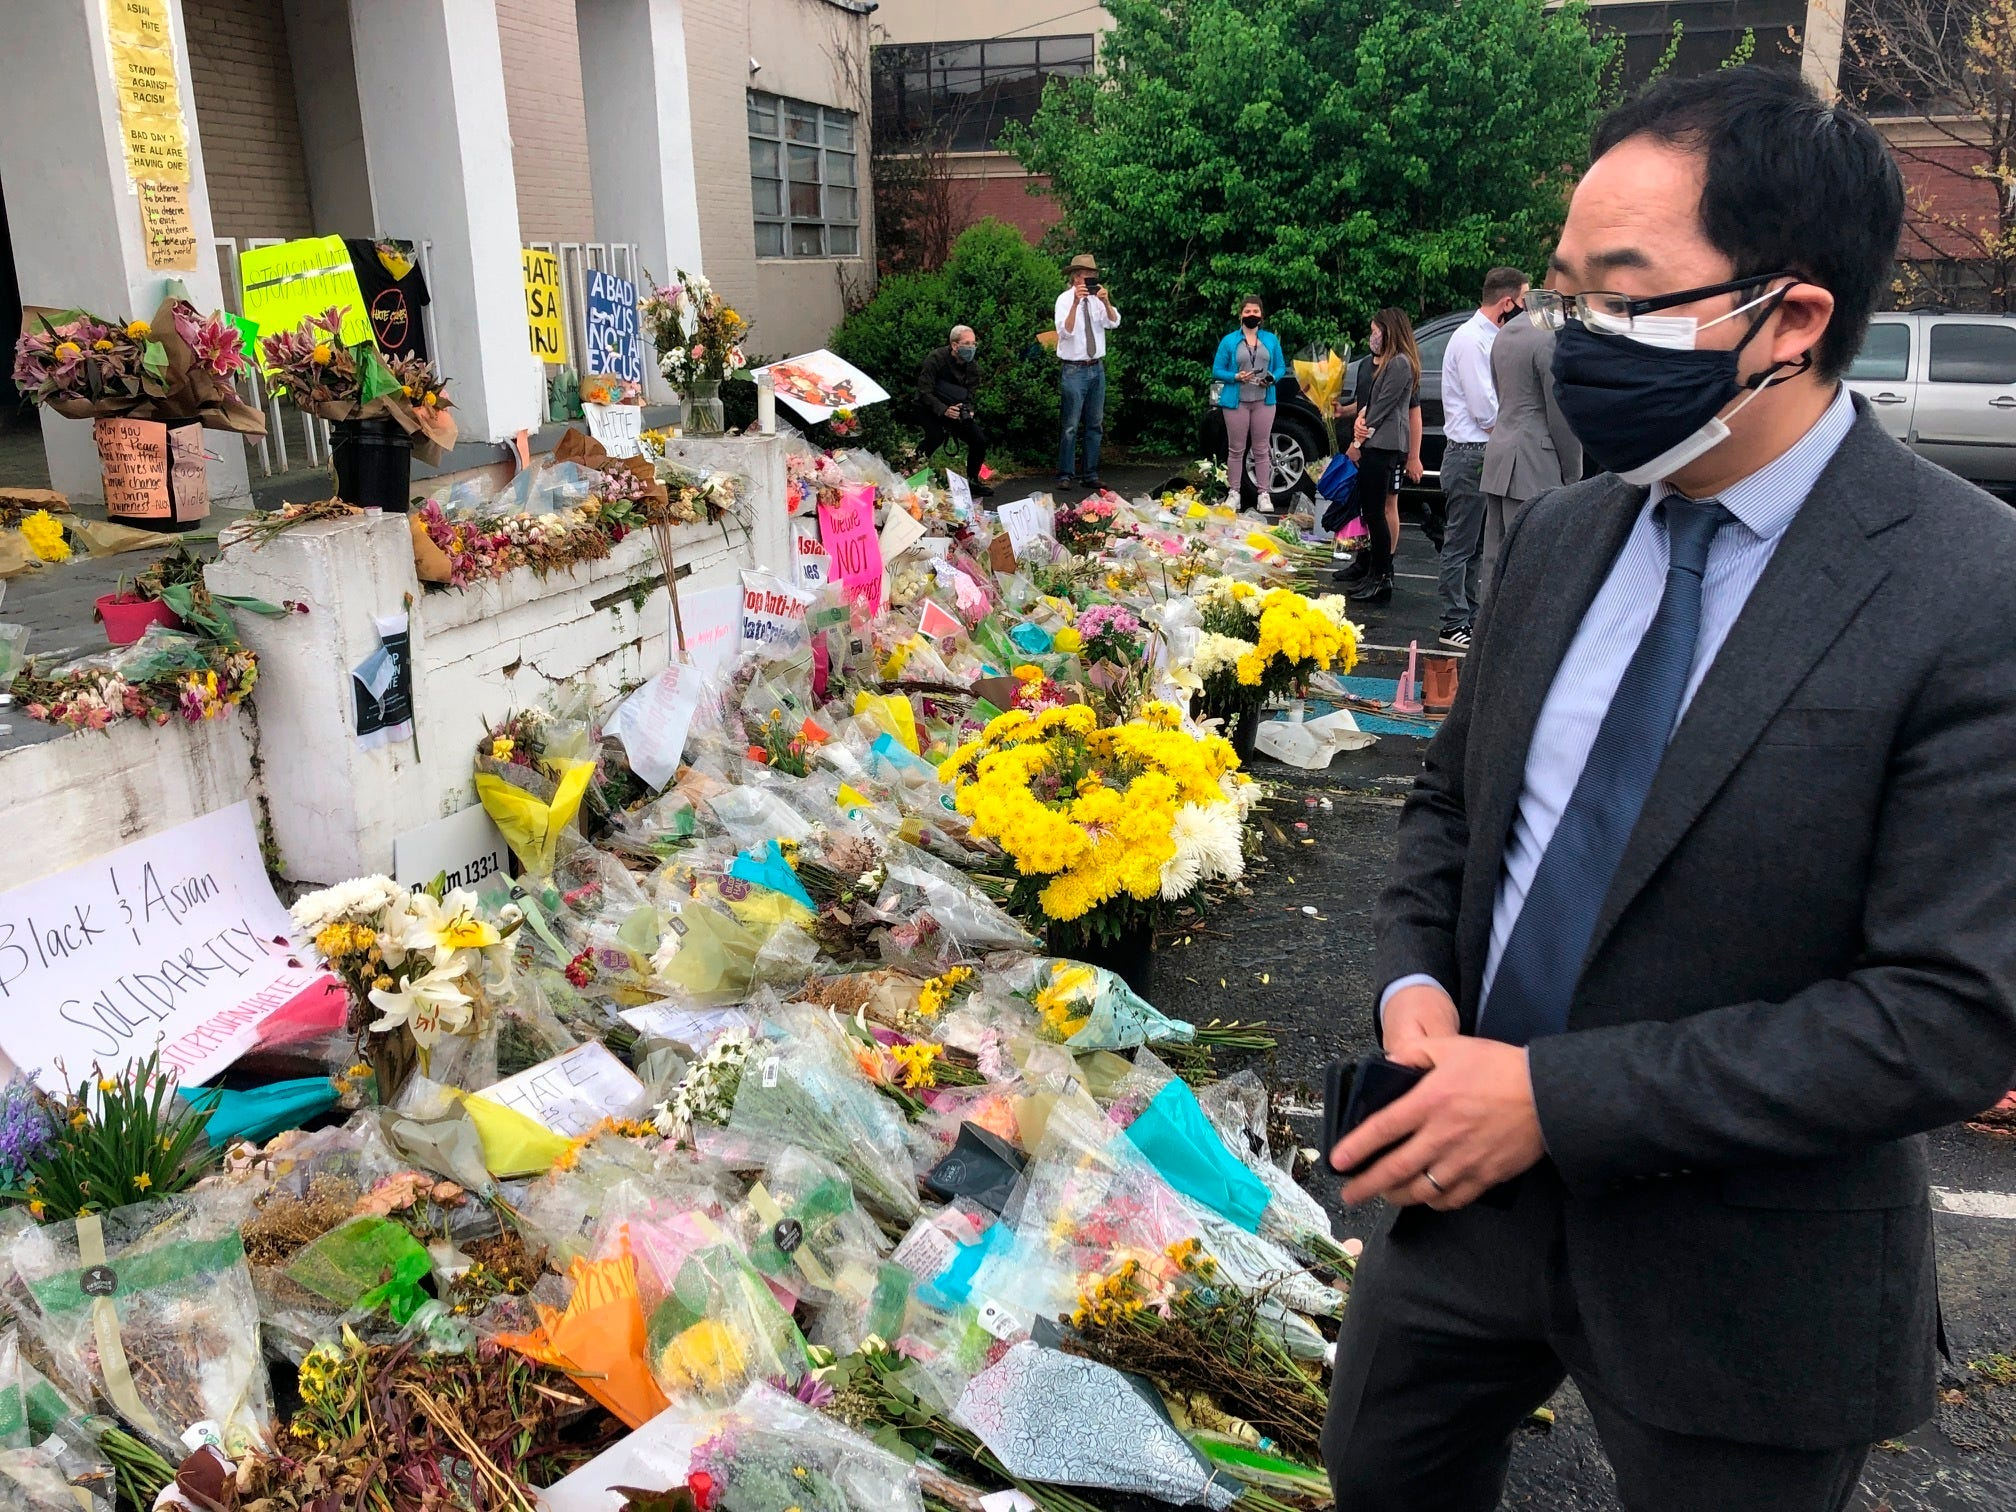 US lawmakers decry violence against Asians in Georgia visit 1